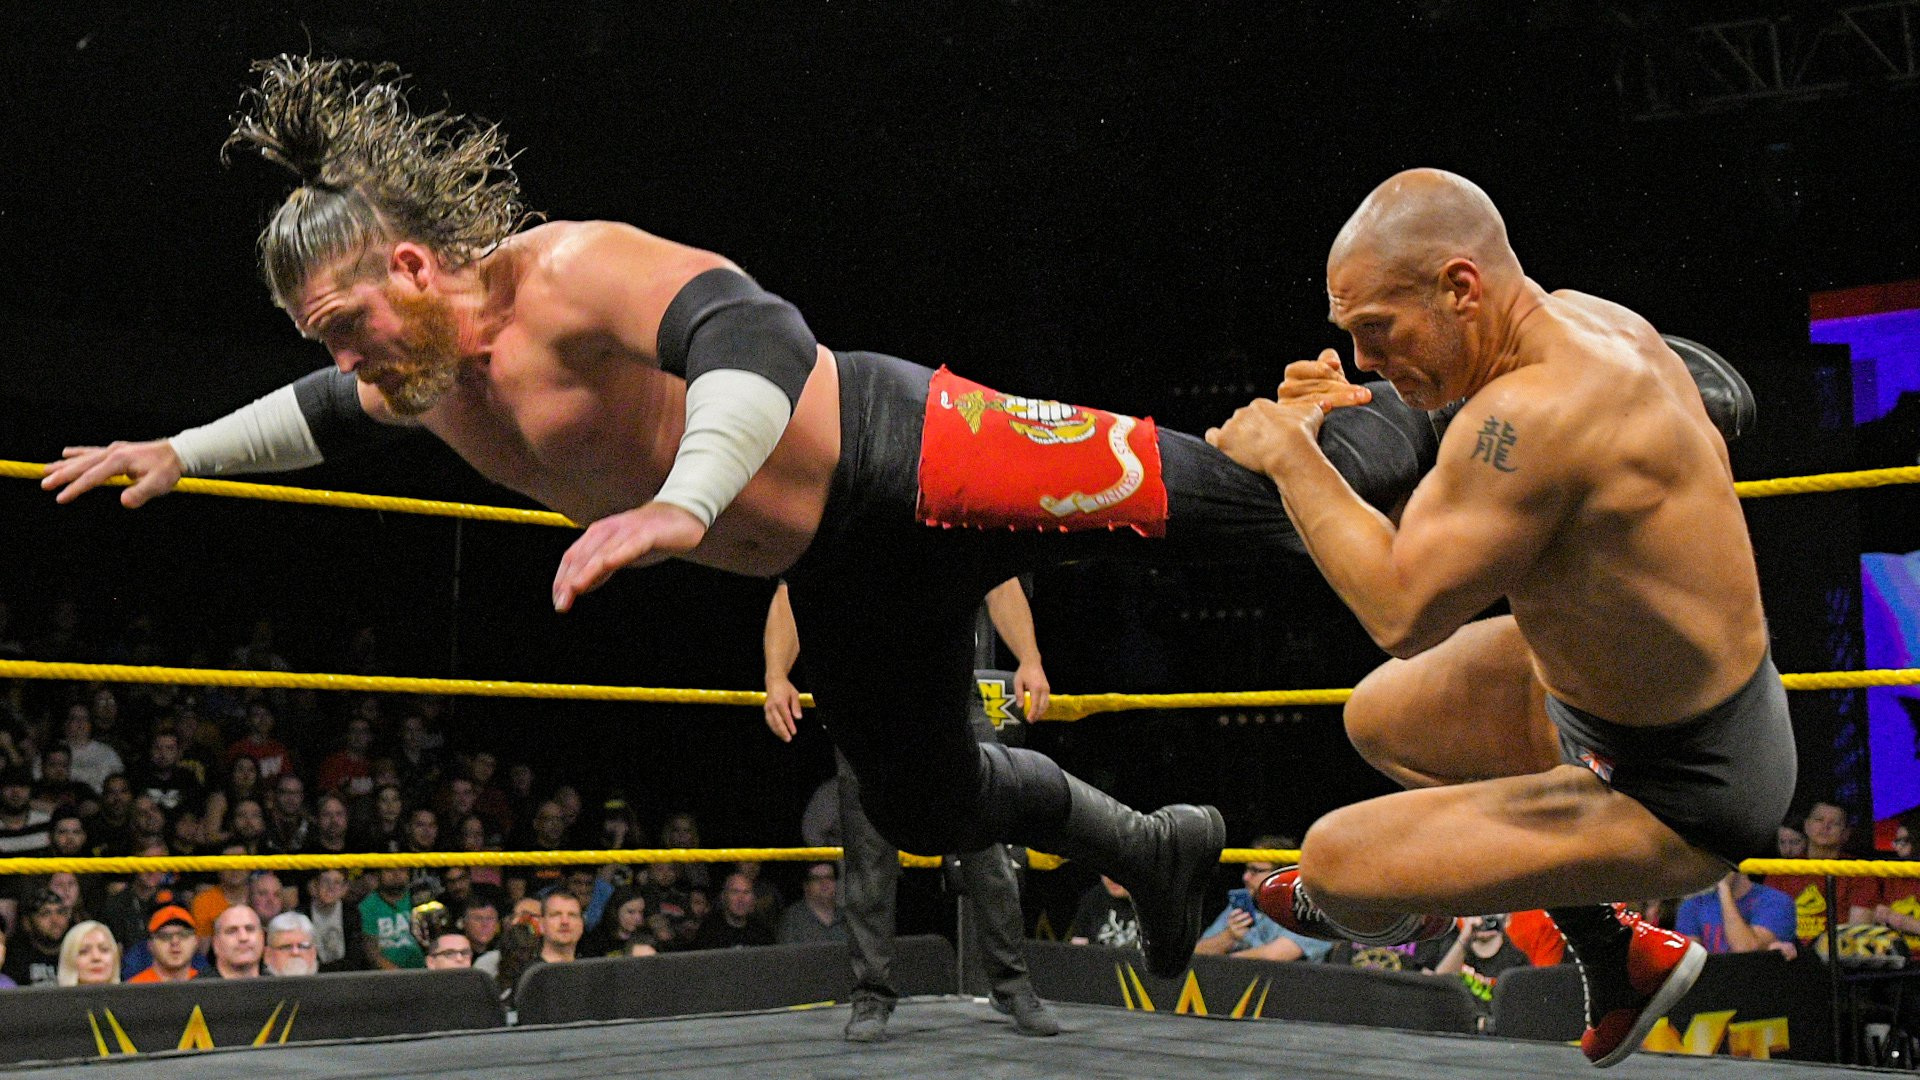 Oney Lorcan & Danny Burch vs. Forgotten Sons: Premier Tour du Dusty Rhodes Tag Team Classic: WWE NXT, 6 Mars 2019